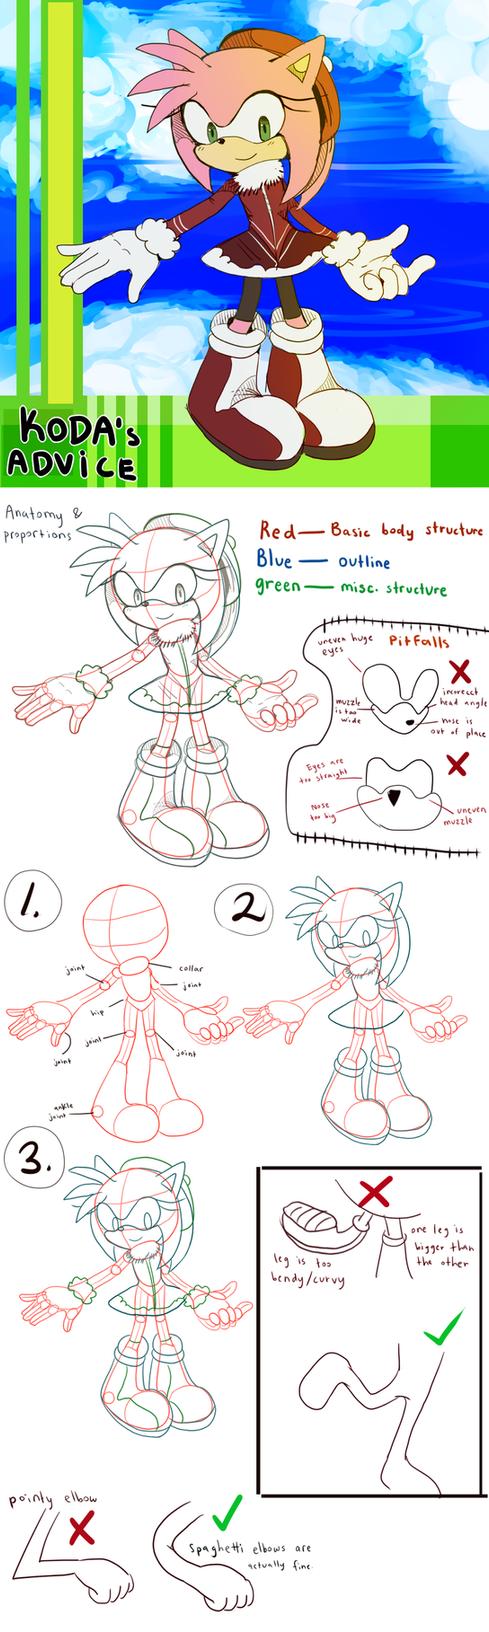 How I draw Amy Rose: Anatomy and Proportions by koda-soda on DeviantArt